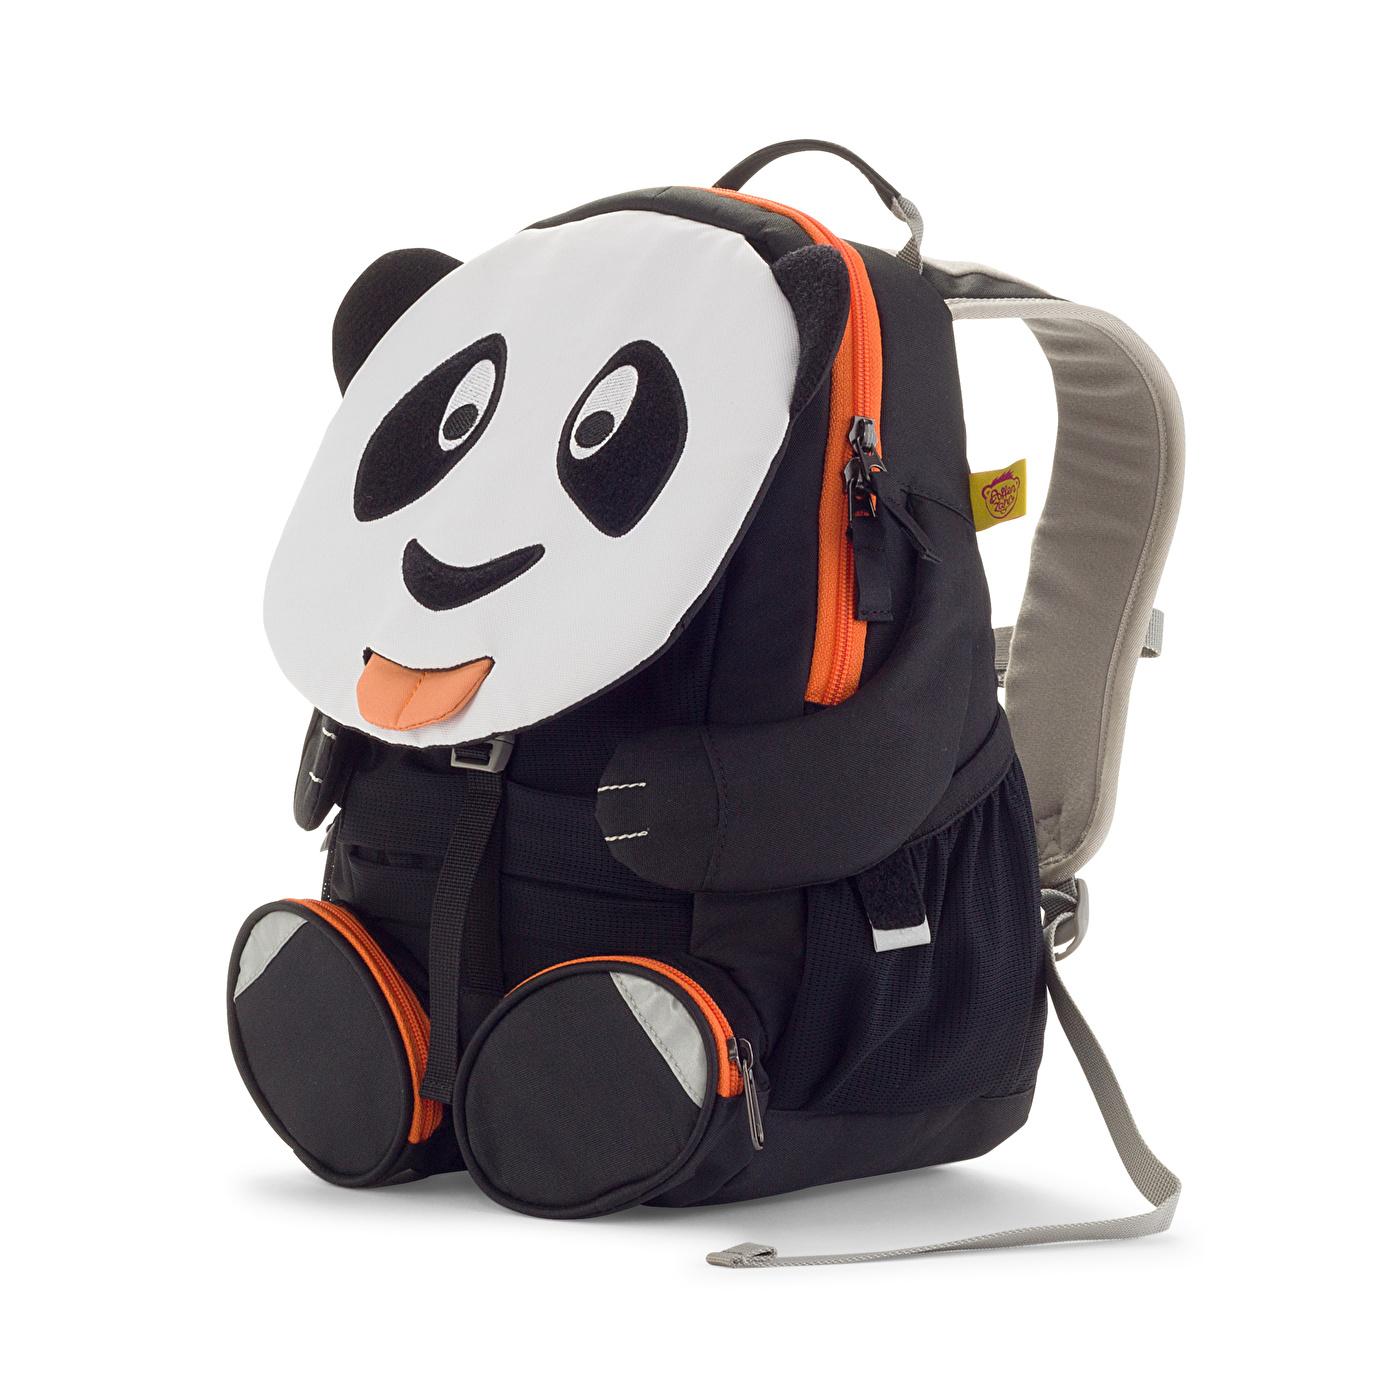 Ryggsäck barn panda AFZ-FAL-001-004-Panda-vl